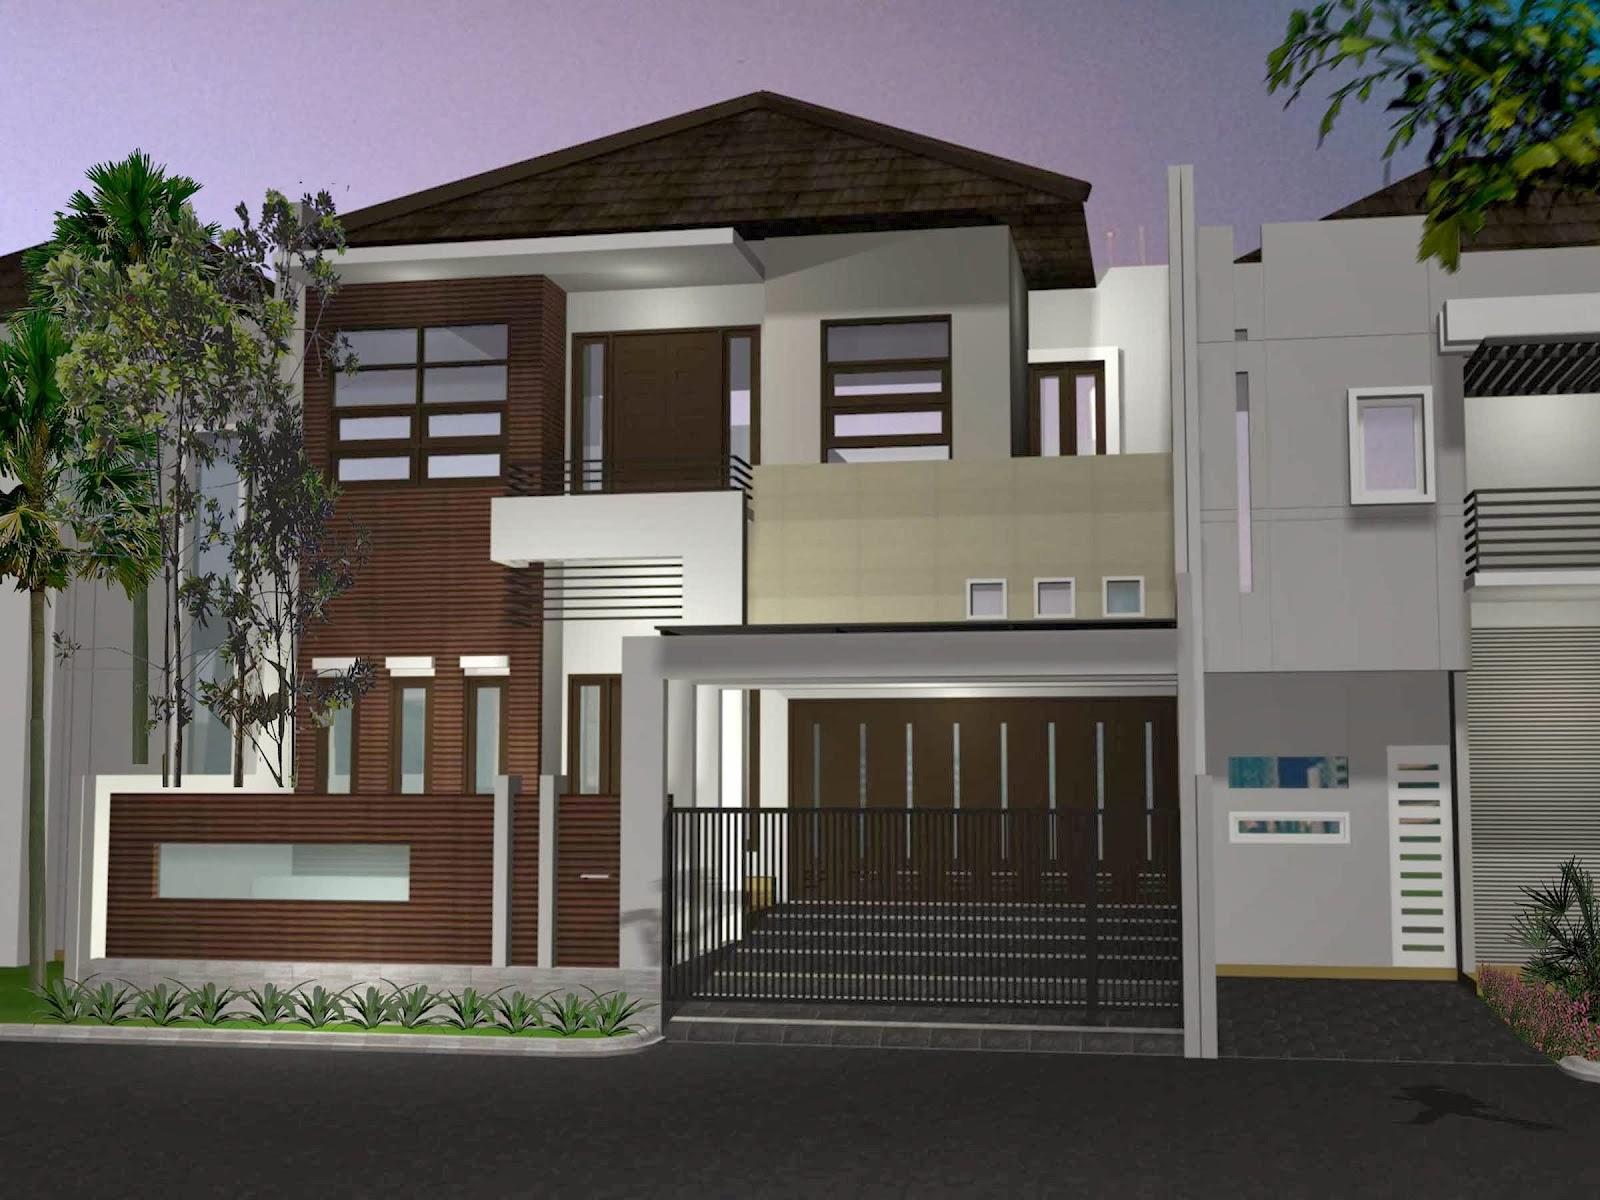 Denah Rumah Minimalis 1 Lantai Desember 2013